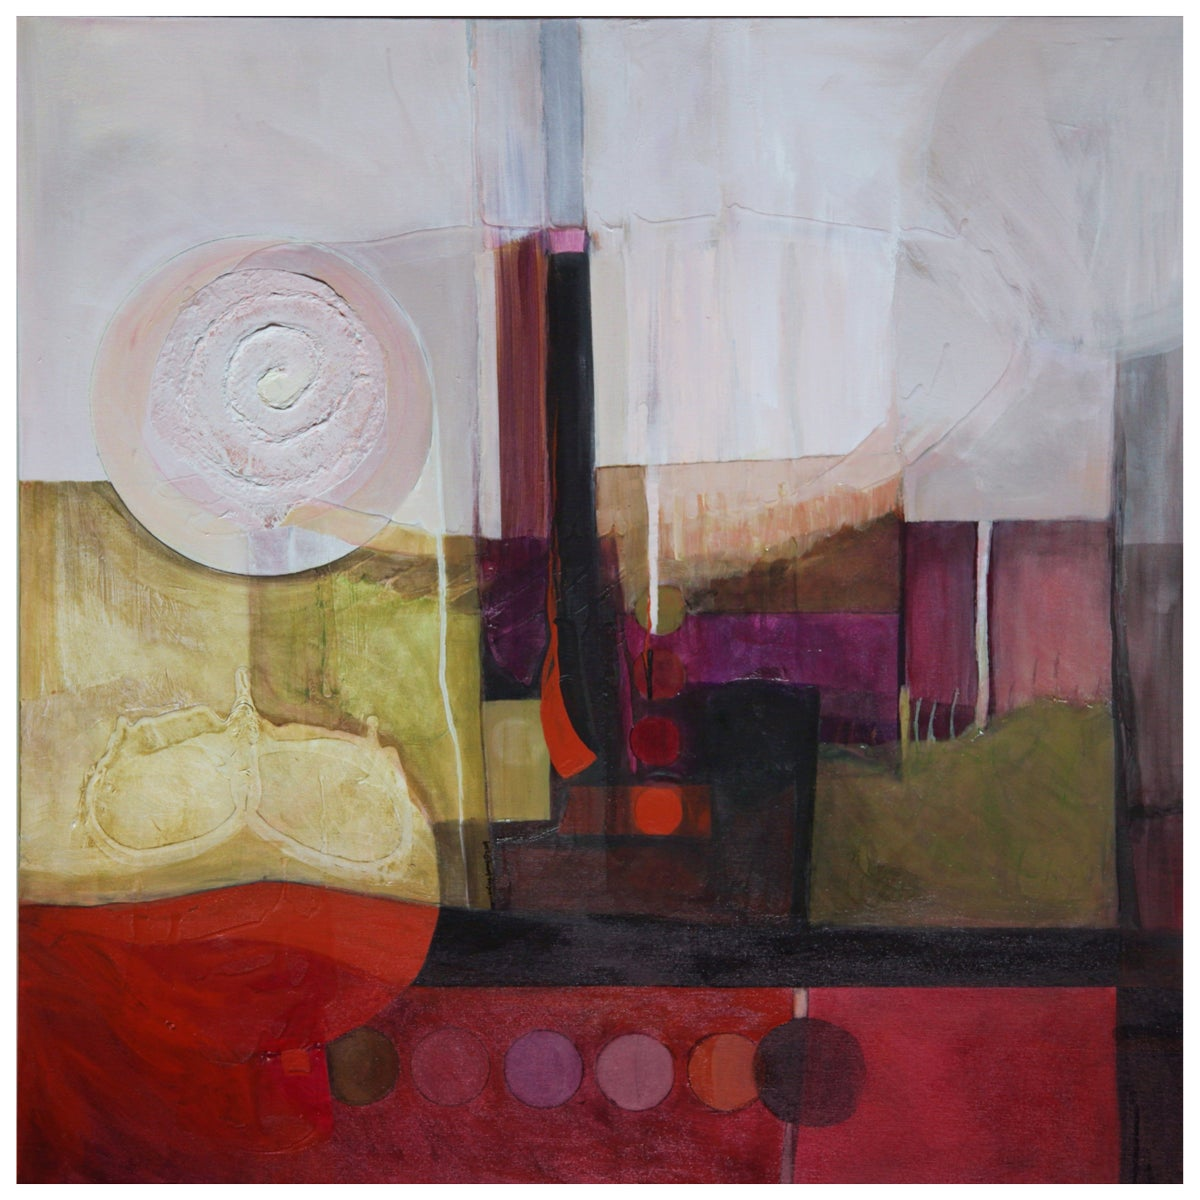 Marlene Burns Modern Abstract Acrylic Mixed-Media Painting Drama Too, 2009